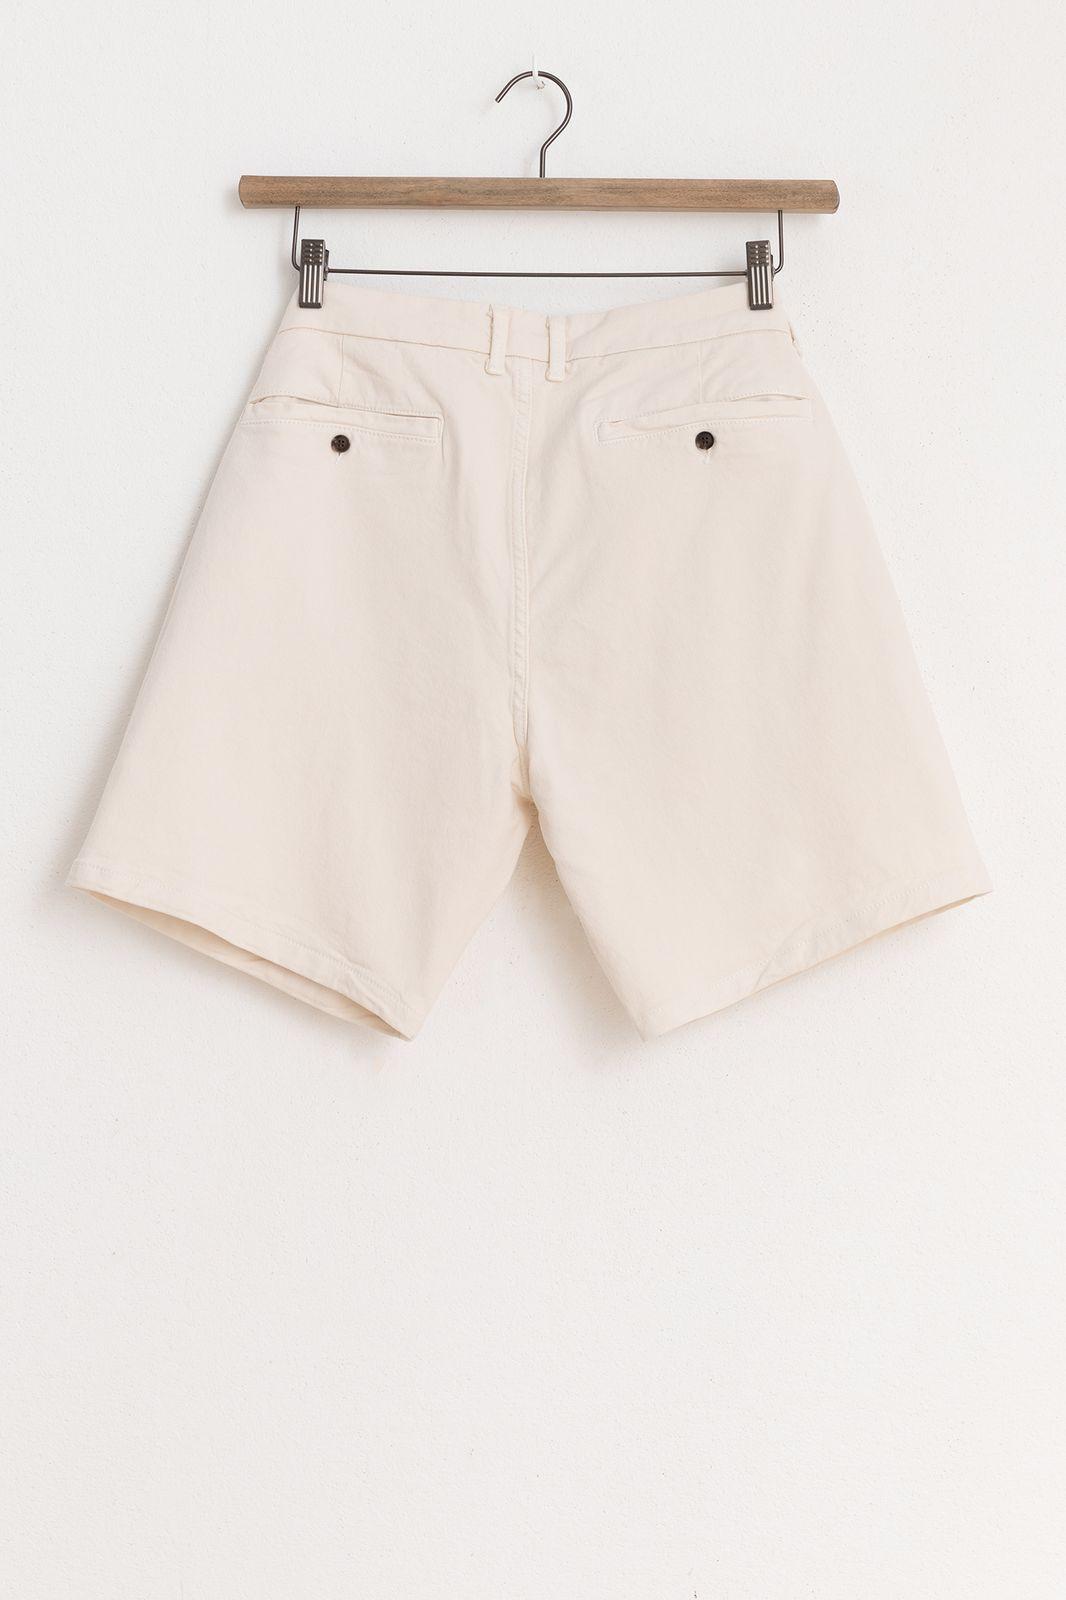 Offwhite chino shorts